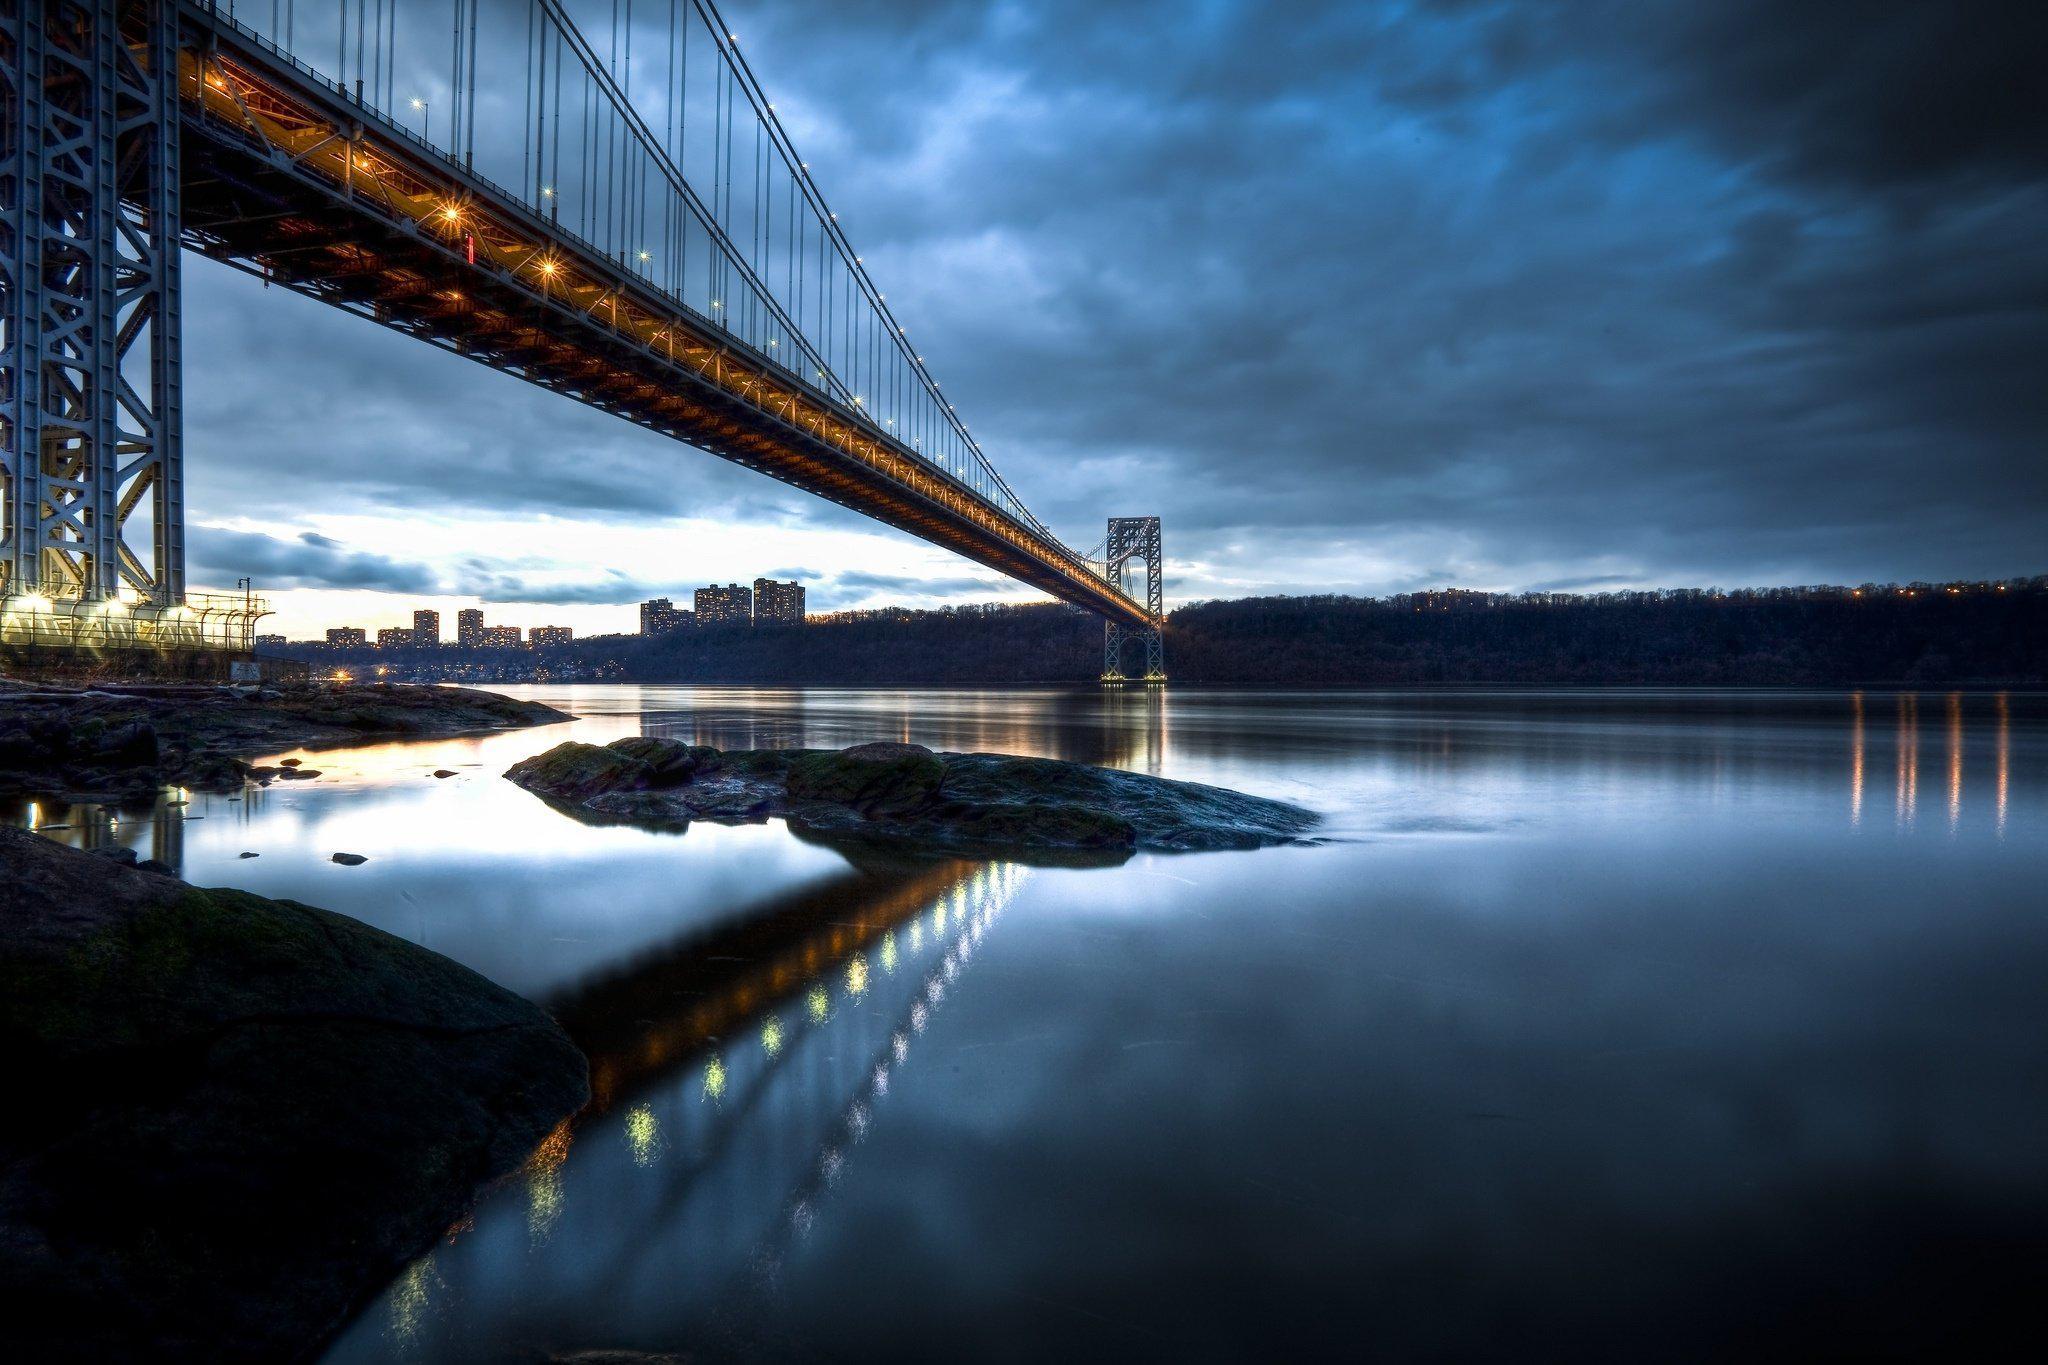 Microsoft 3d Desktop Wallpaper Hd George Washington Bridge Manhattan New Jersey Hudson